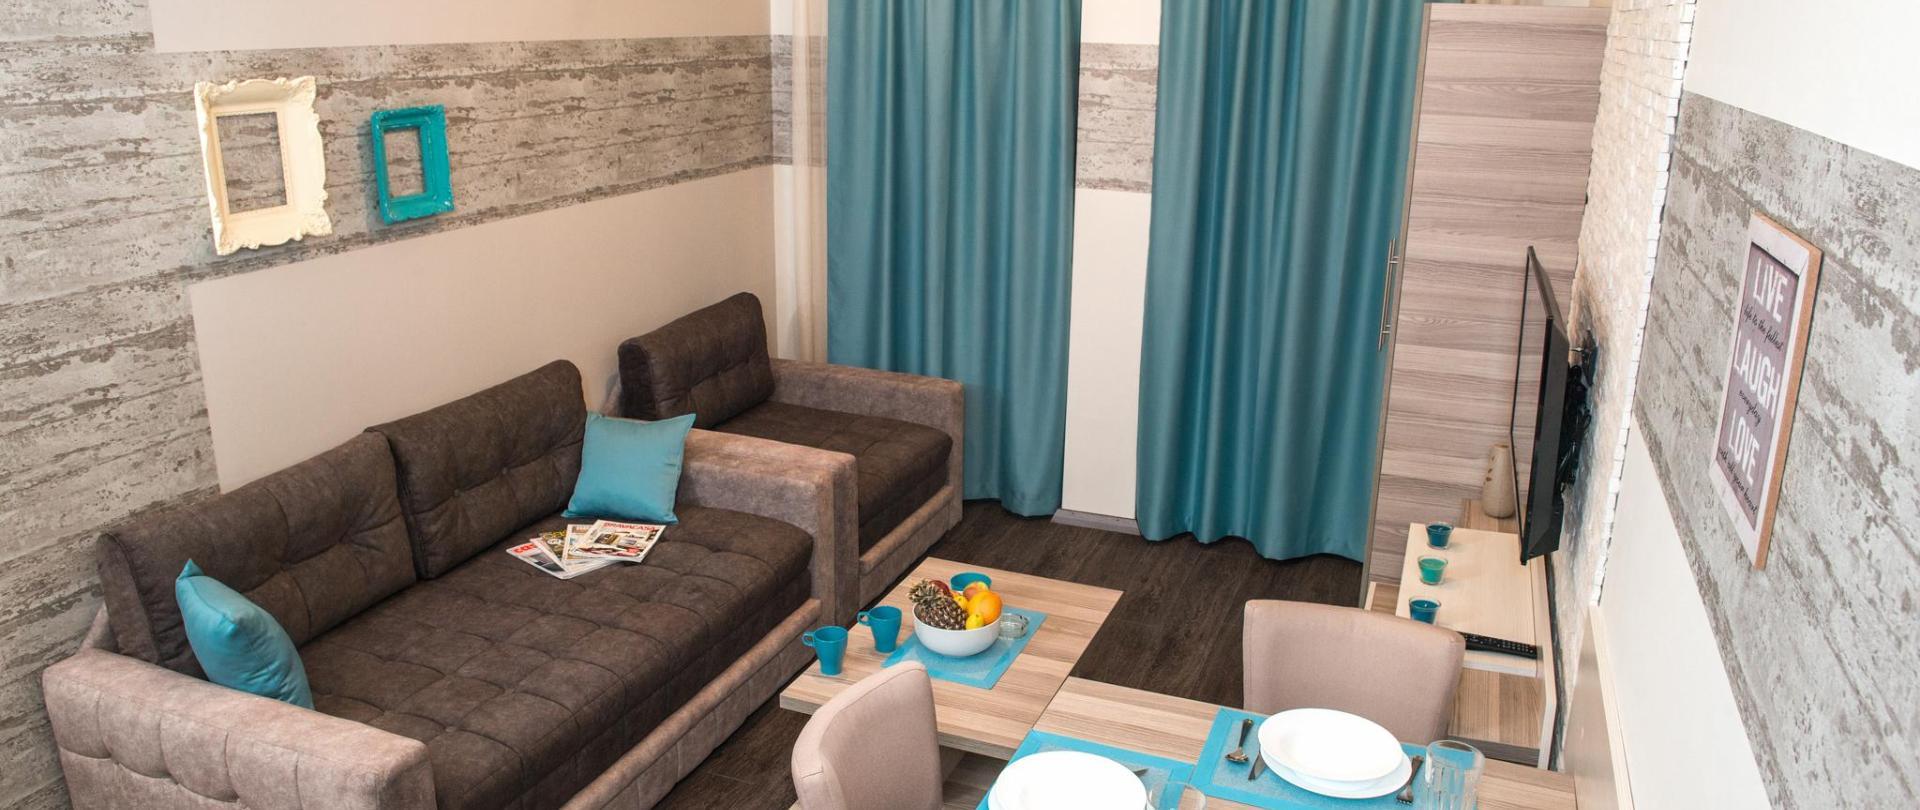 Marrilux apartments